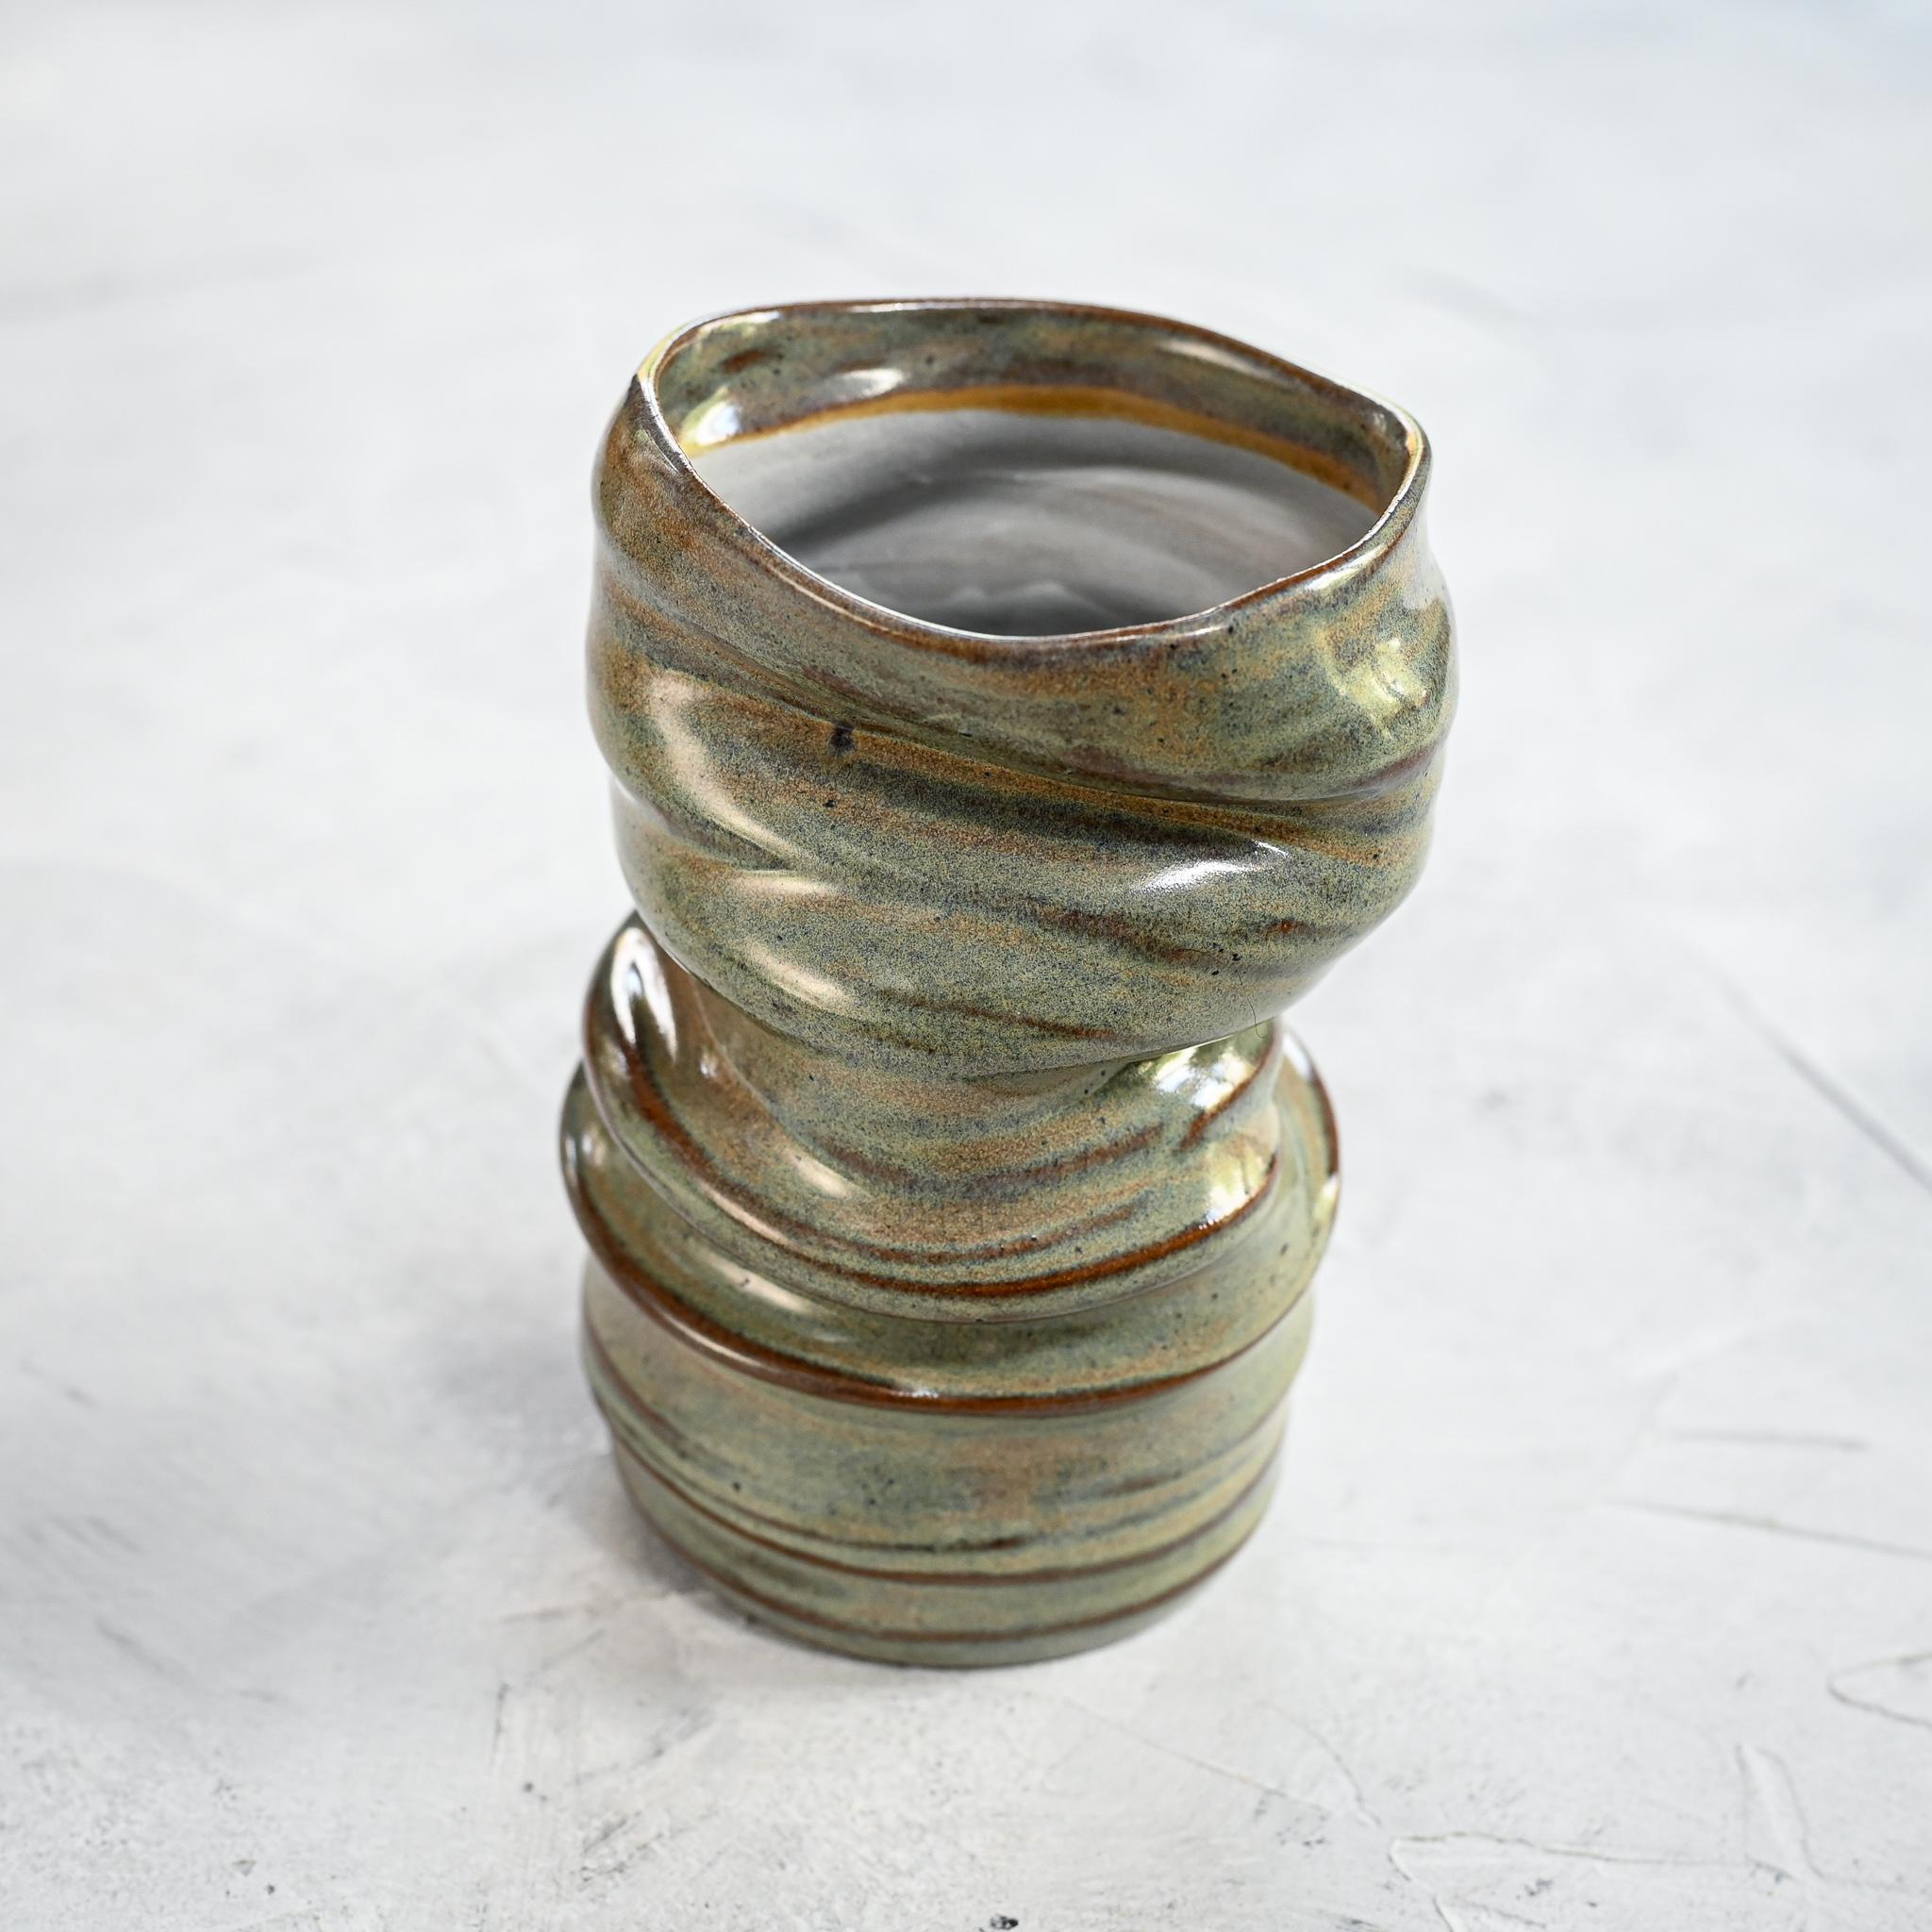 картинка Керамическая ваза-стакан Deya - DishWishes.Ru